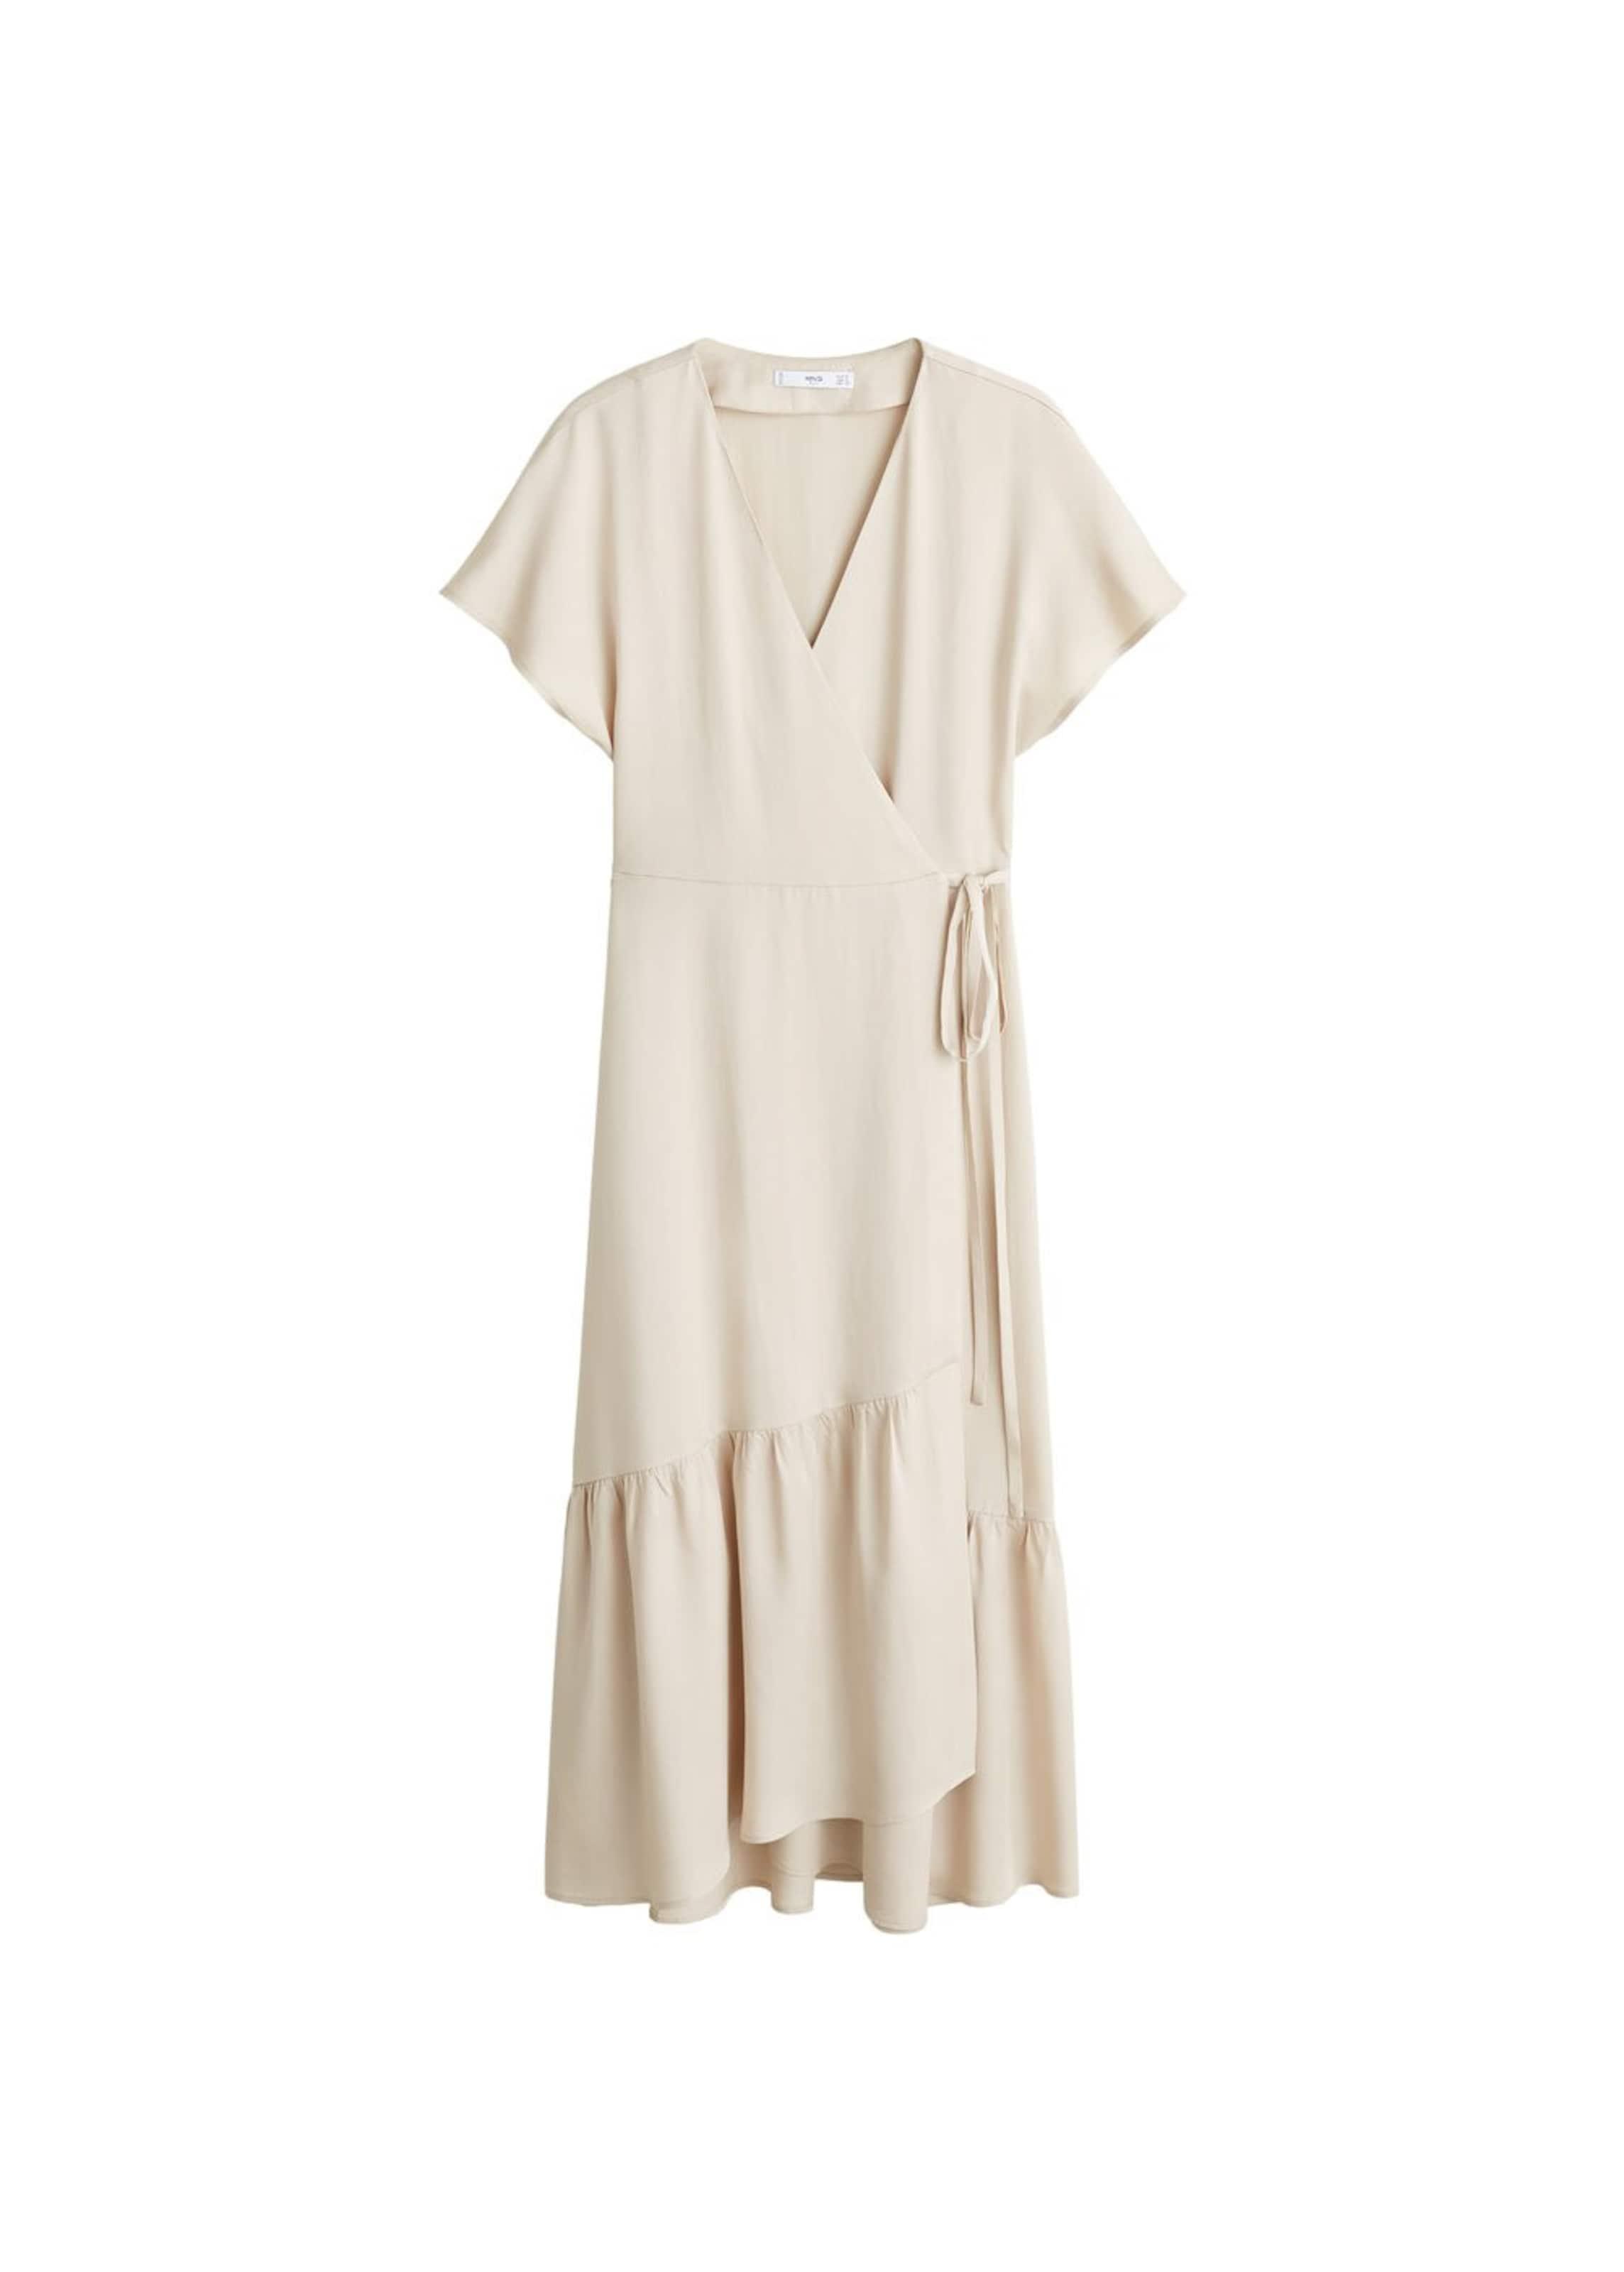 'maria' In Mango Mango 'maria' Nude Mango Nude Kleid Kleid Kleid 'maria' In dthsQr